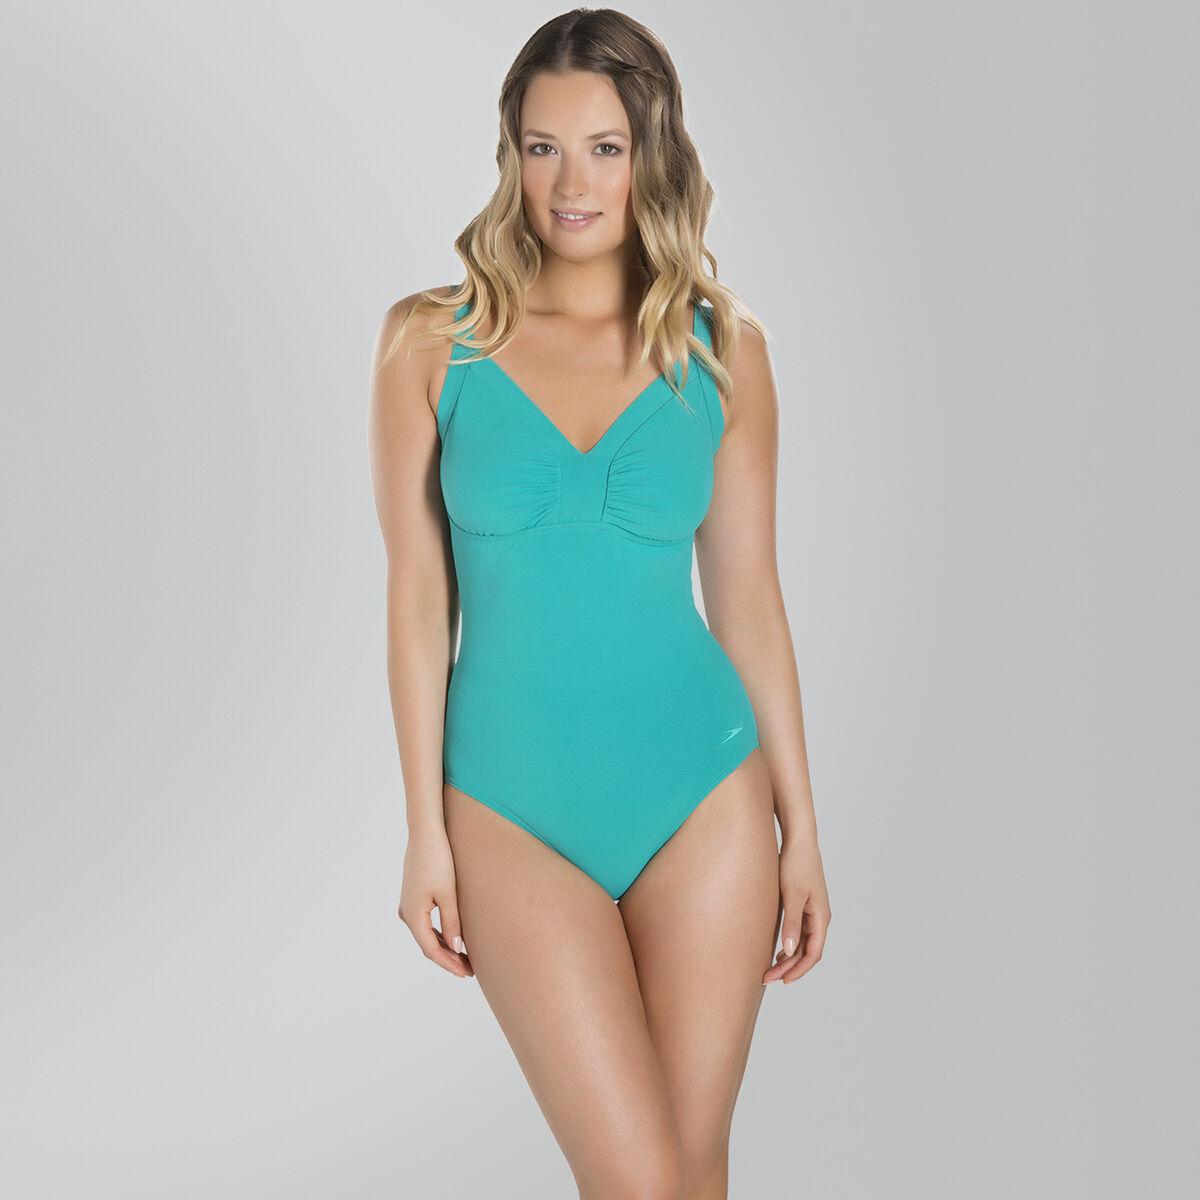 Sculpture Watergem Swimsuit